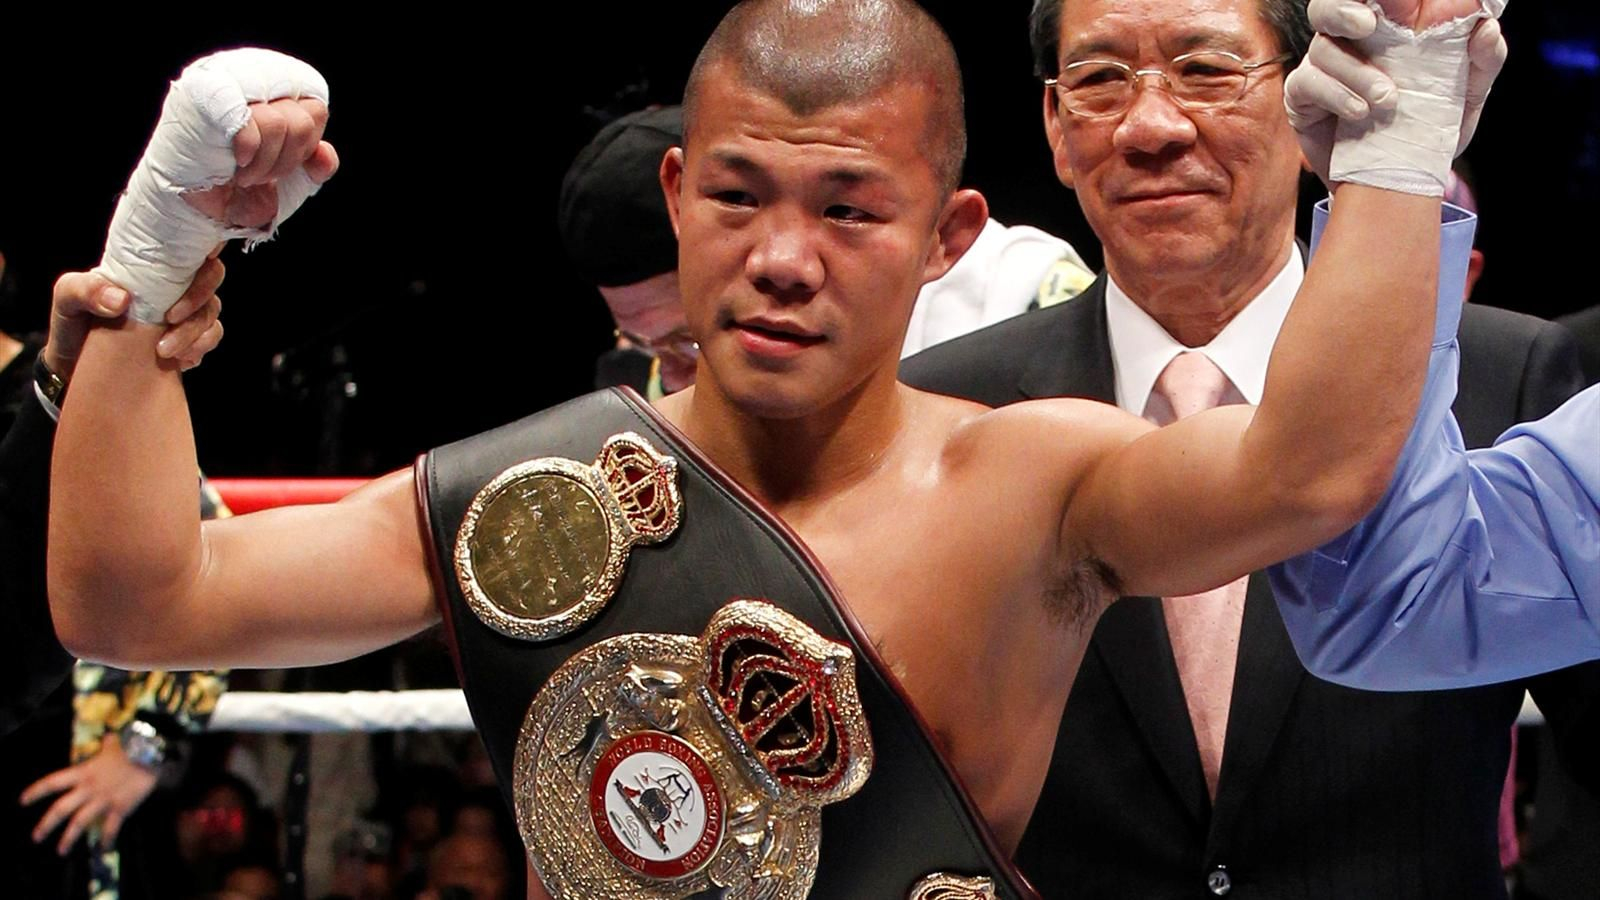 Kohei Kono vs Koki Kameda por el título súper mosca AMB en Chicago